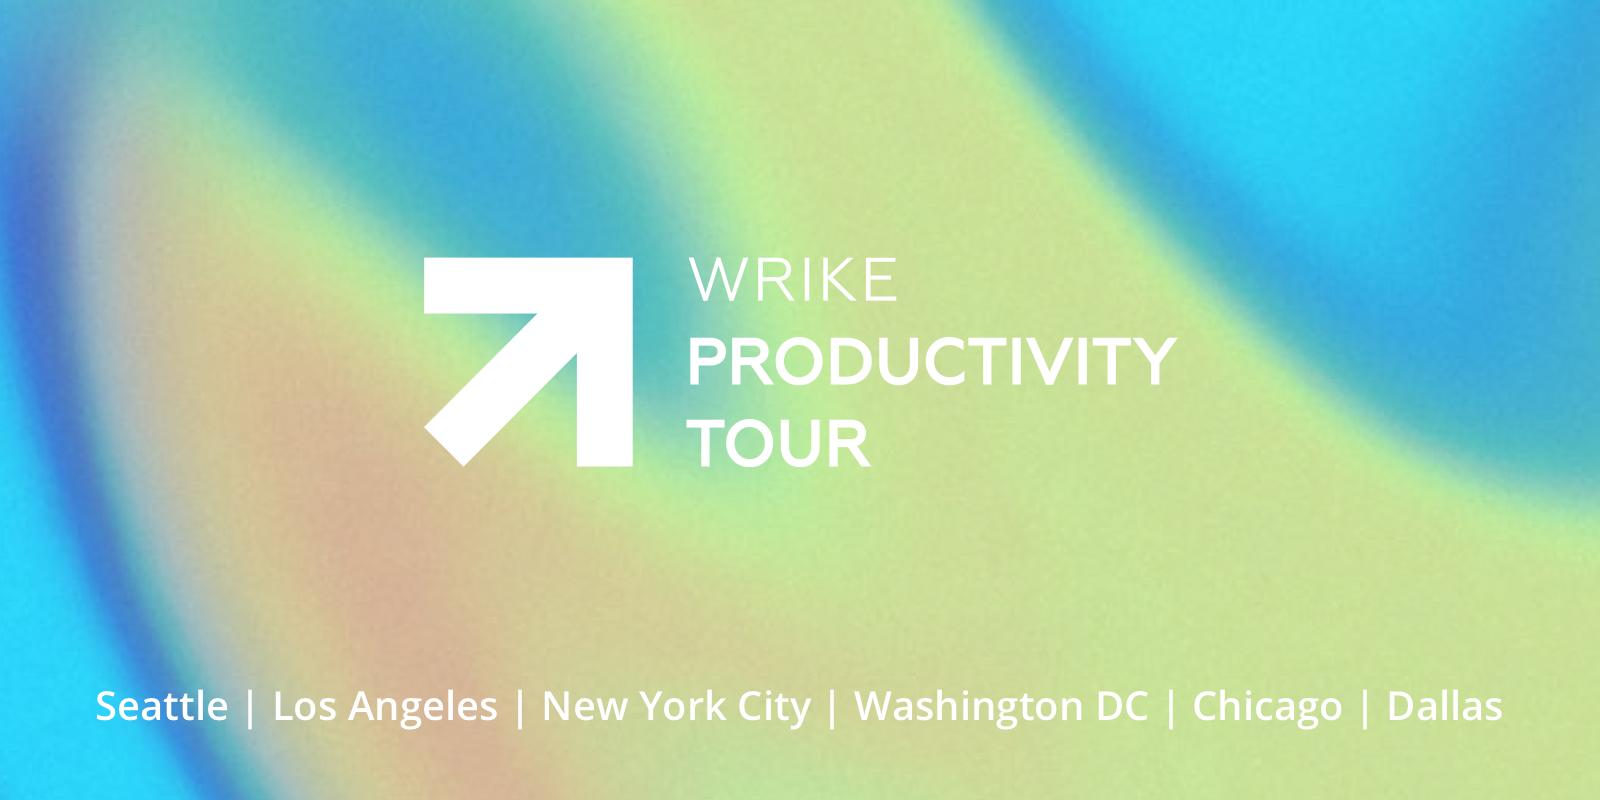 Productivity Tour Wrike